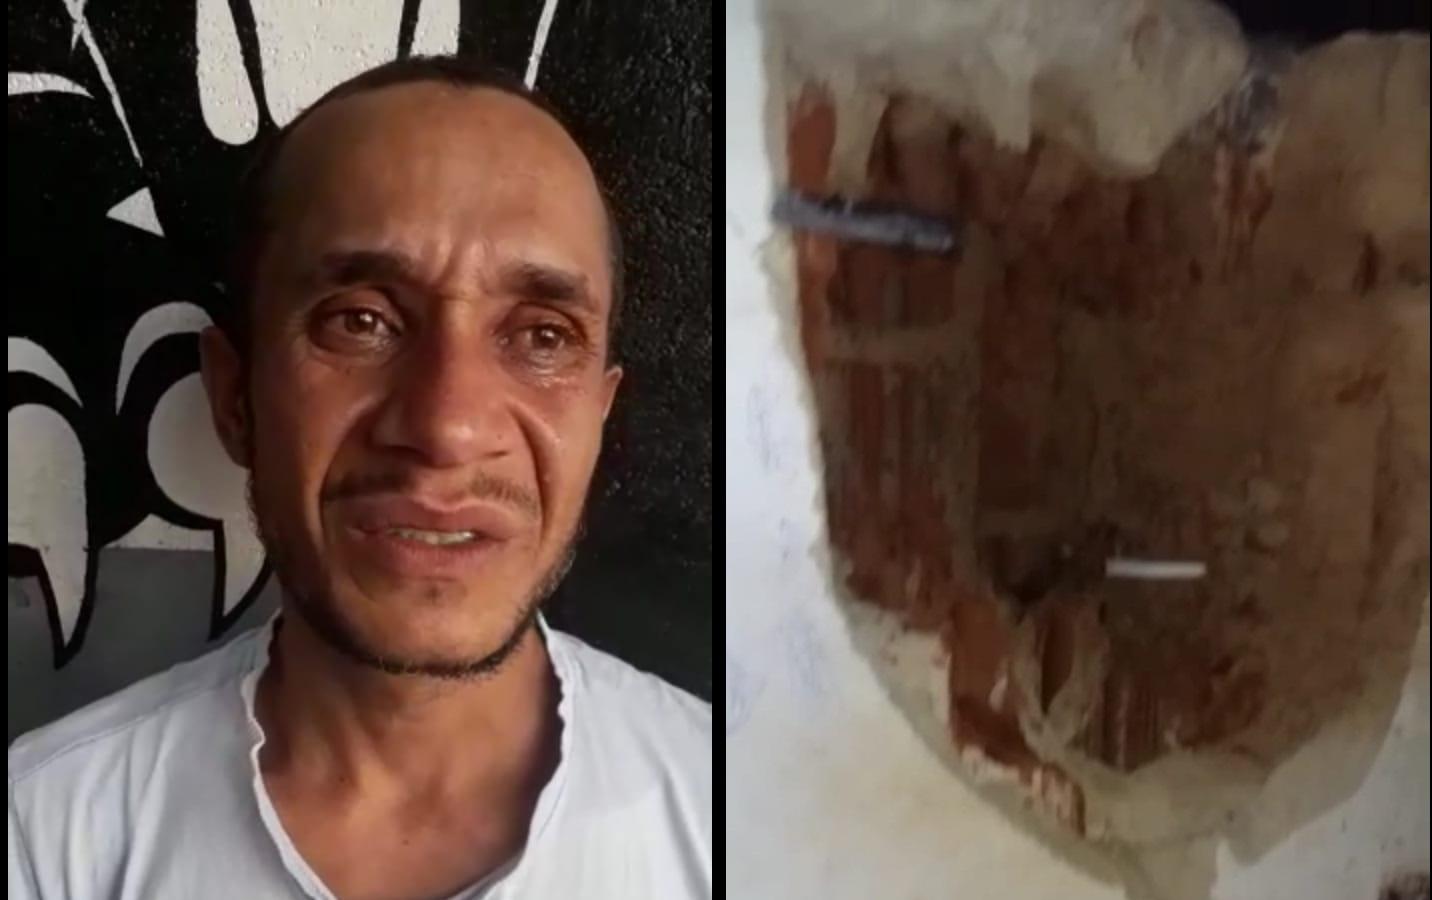 Agentes prisionais da CPP de Paraíso frustra plano de fuga